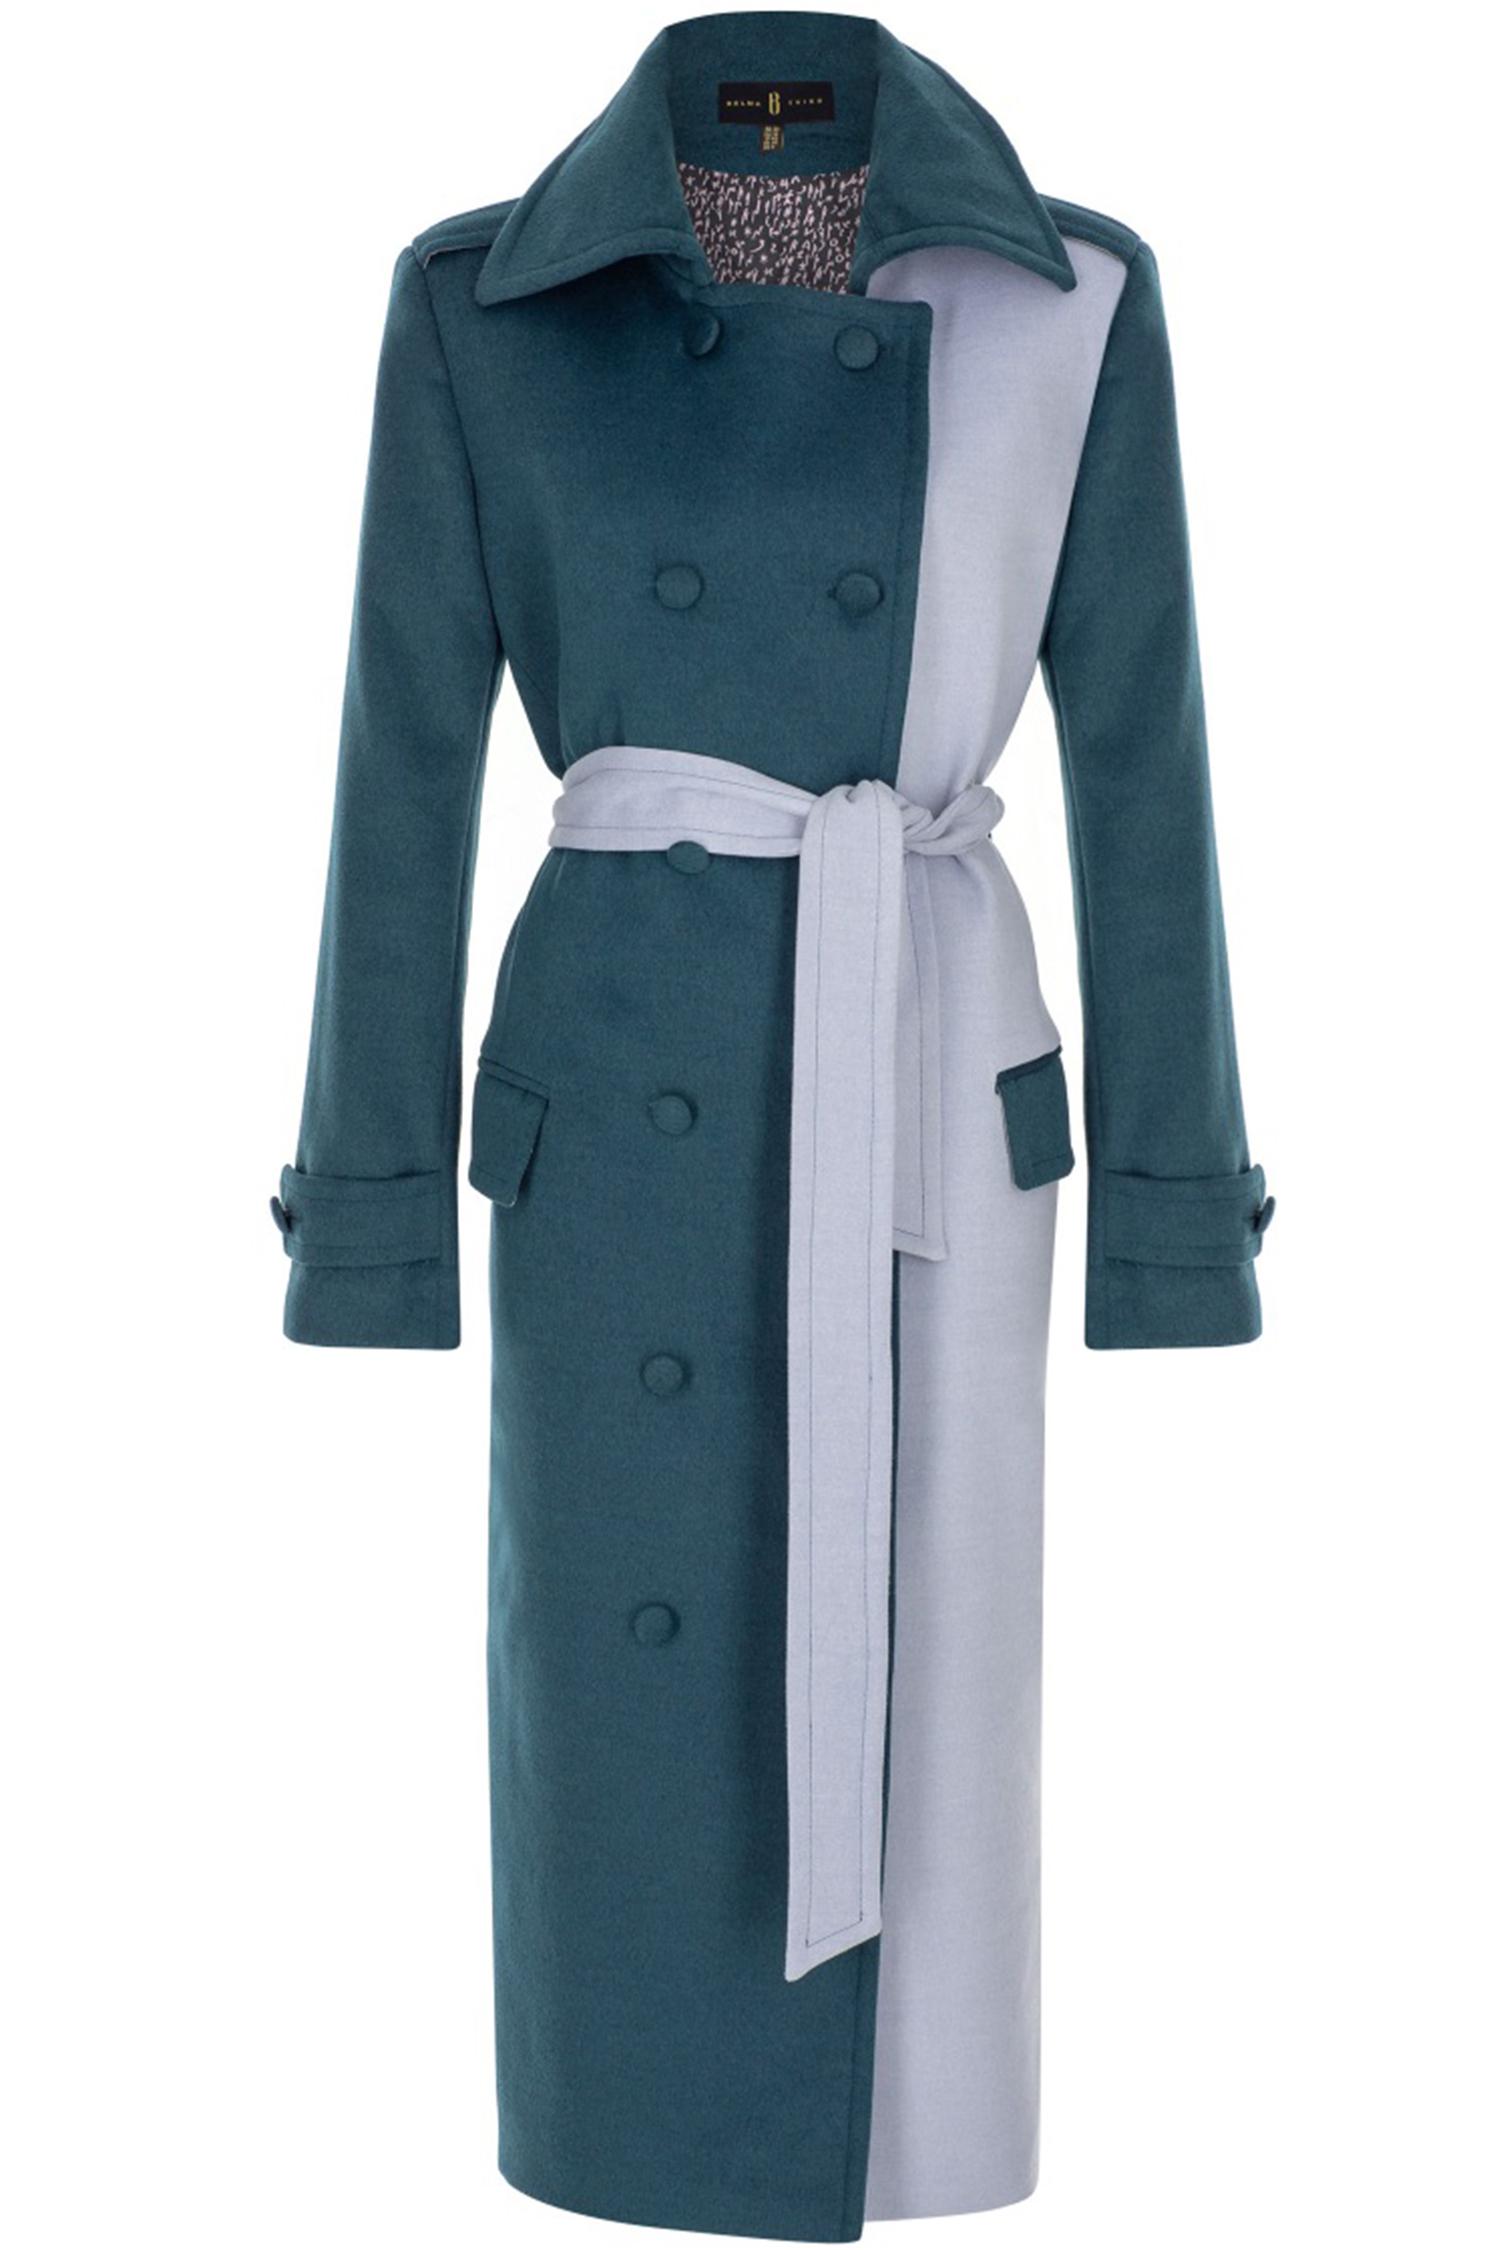 coat, twosided,wintercoat, fw 21/22